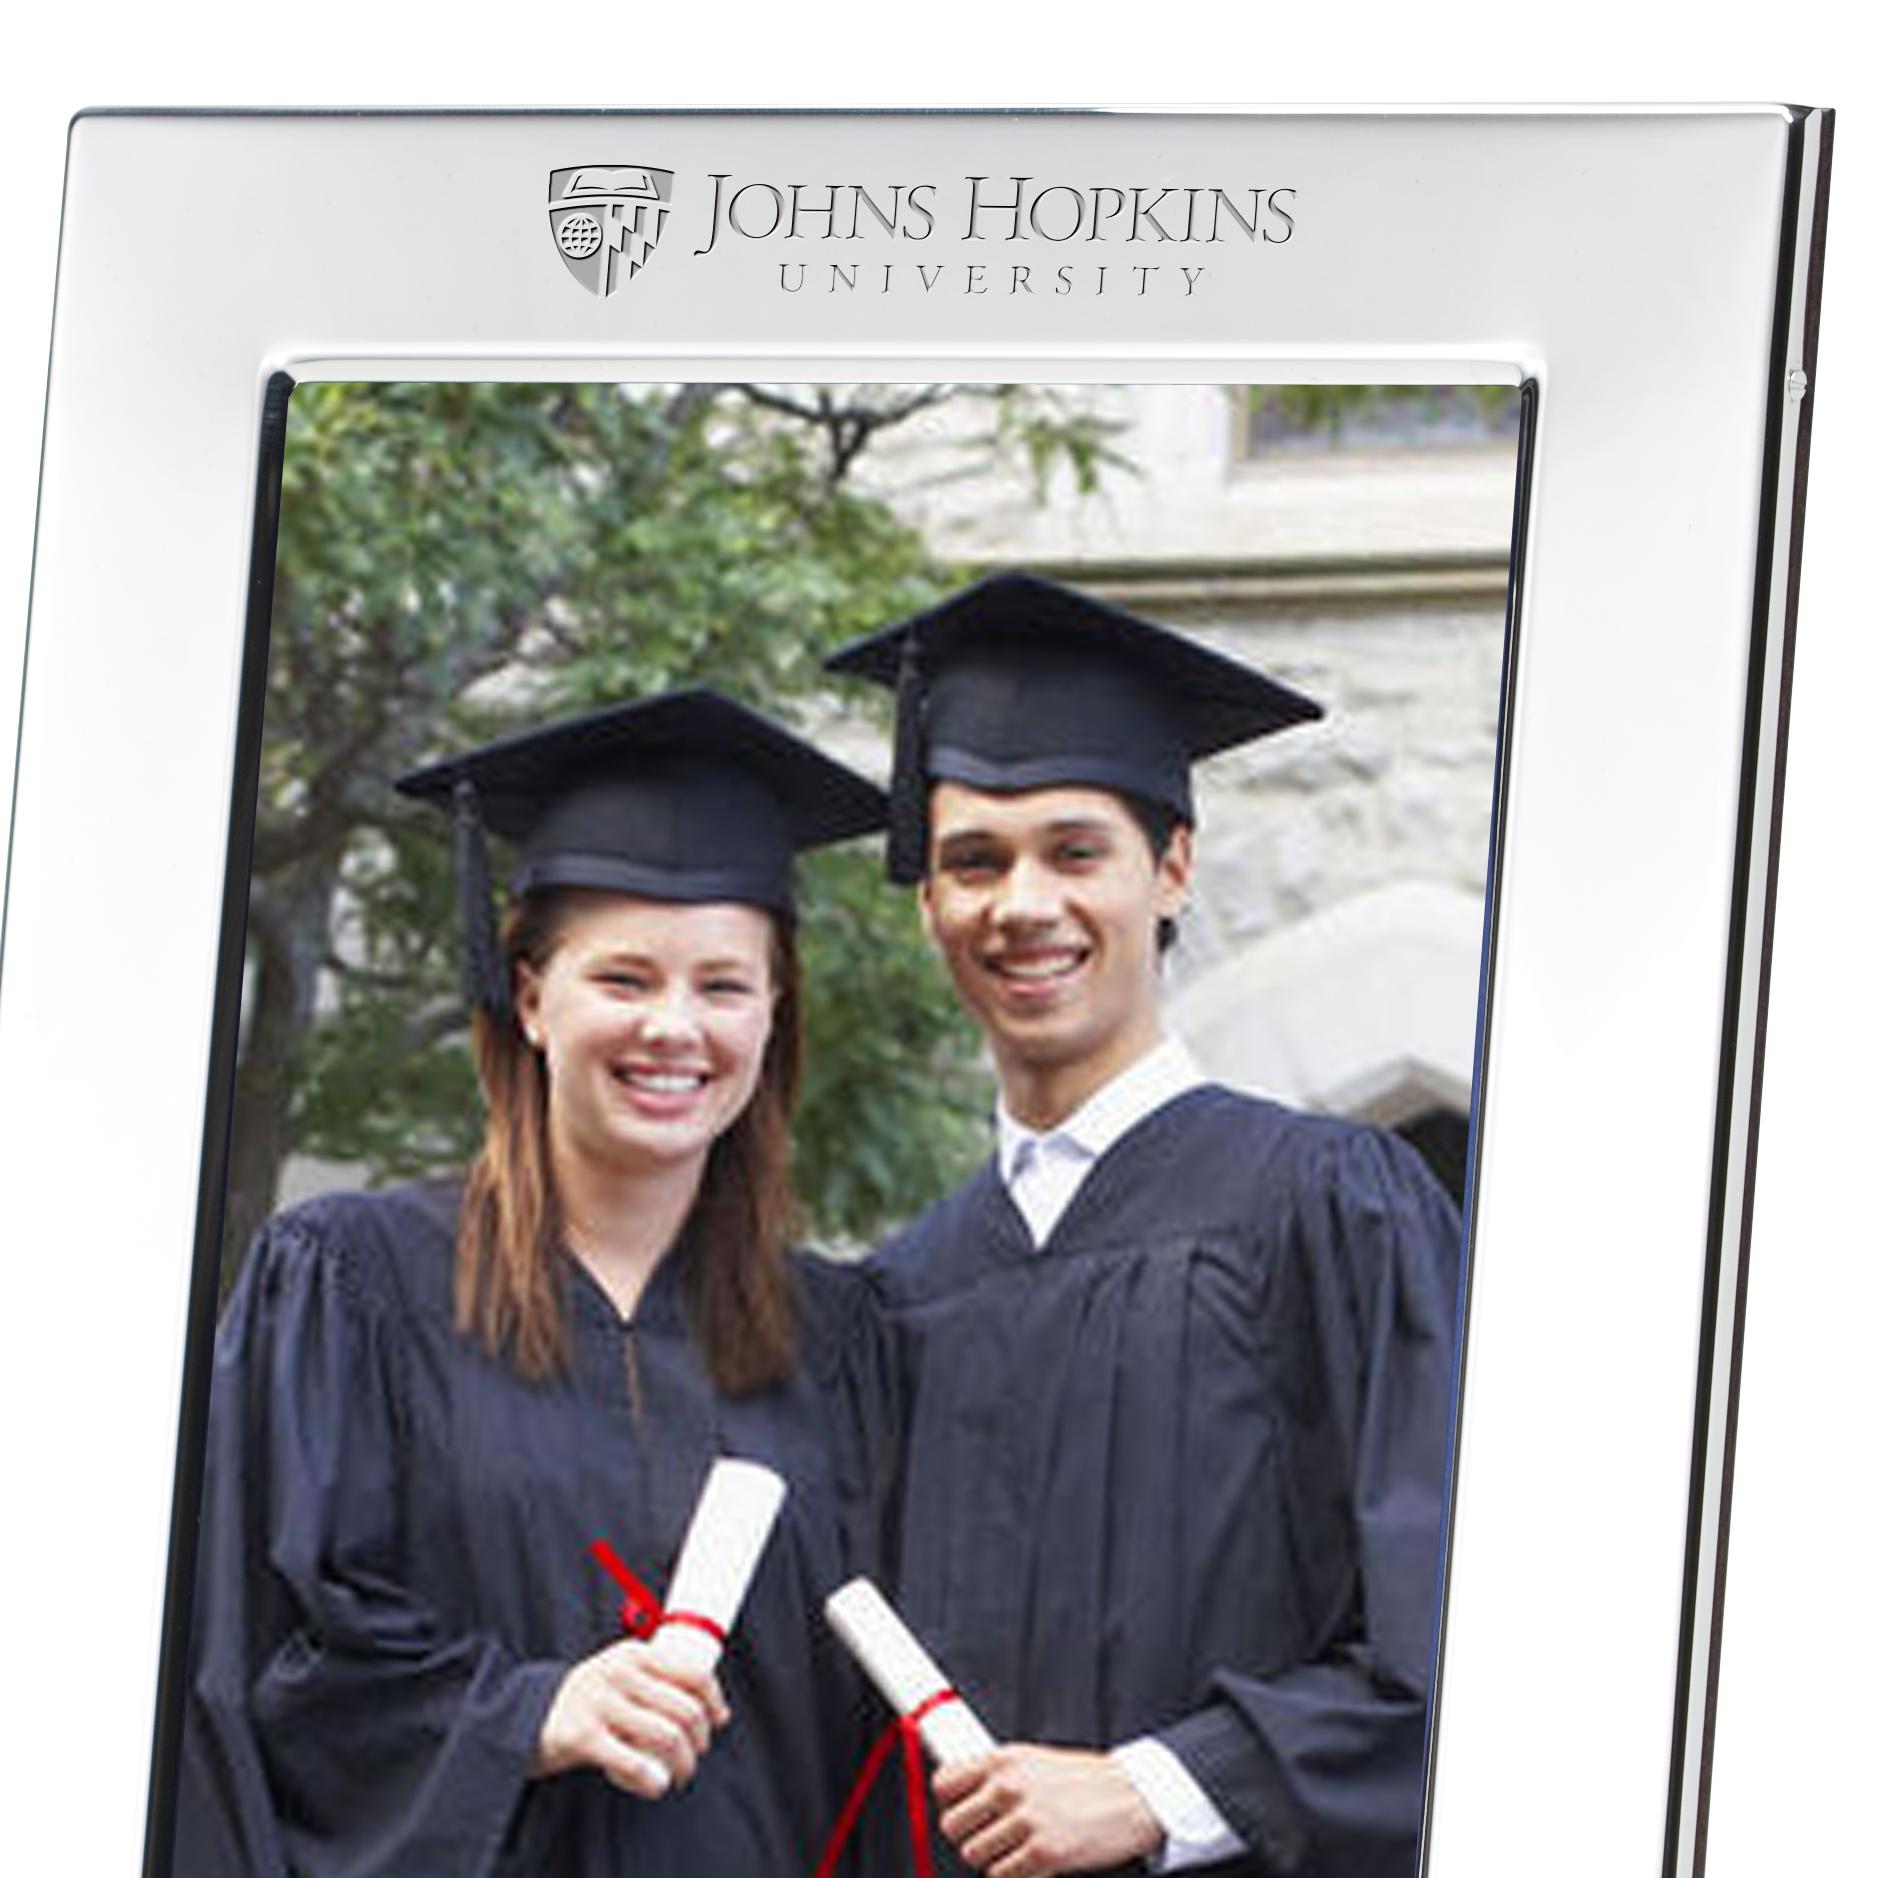 Johns Hopkins Polished Pewter 5x7 Picture Frame - Image 2